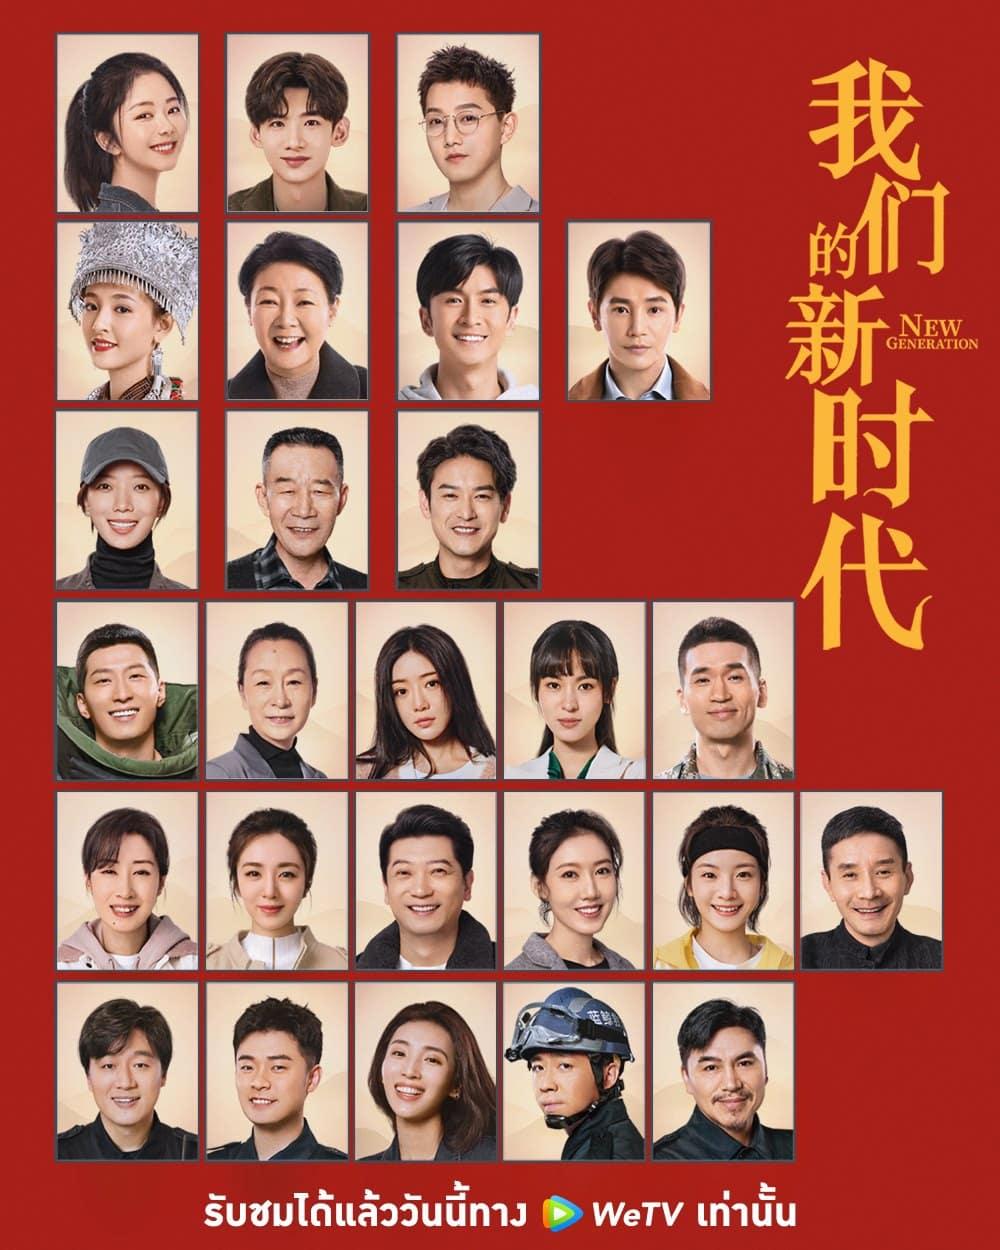 New Generation (2021) ยุคใหม่ของพวกเรา ซับไทย EP1-EP9